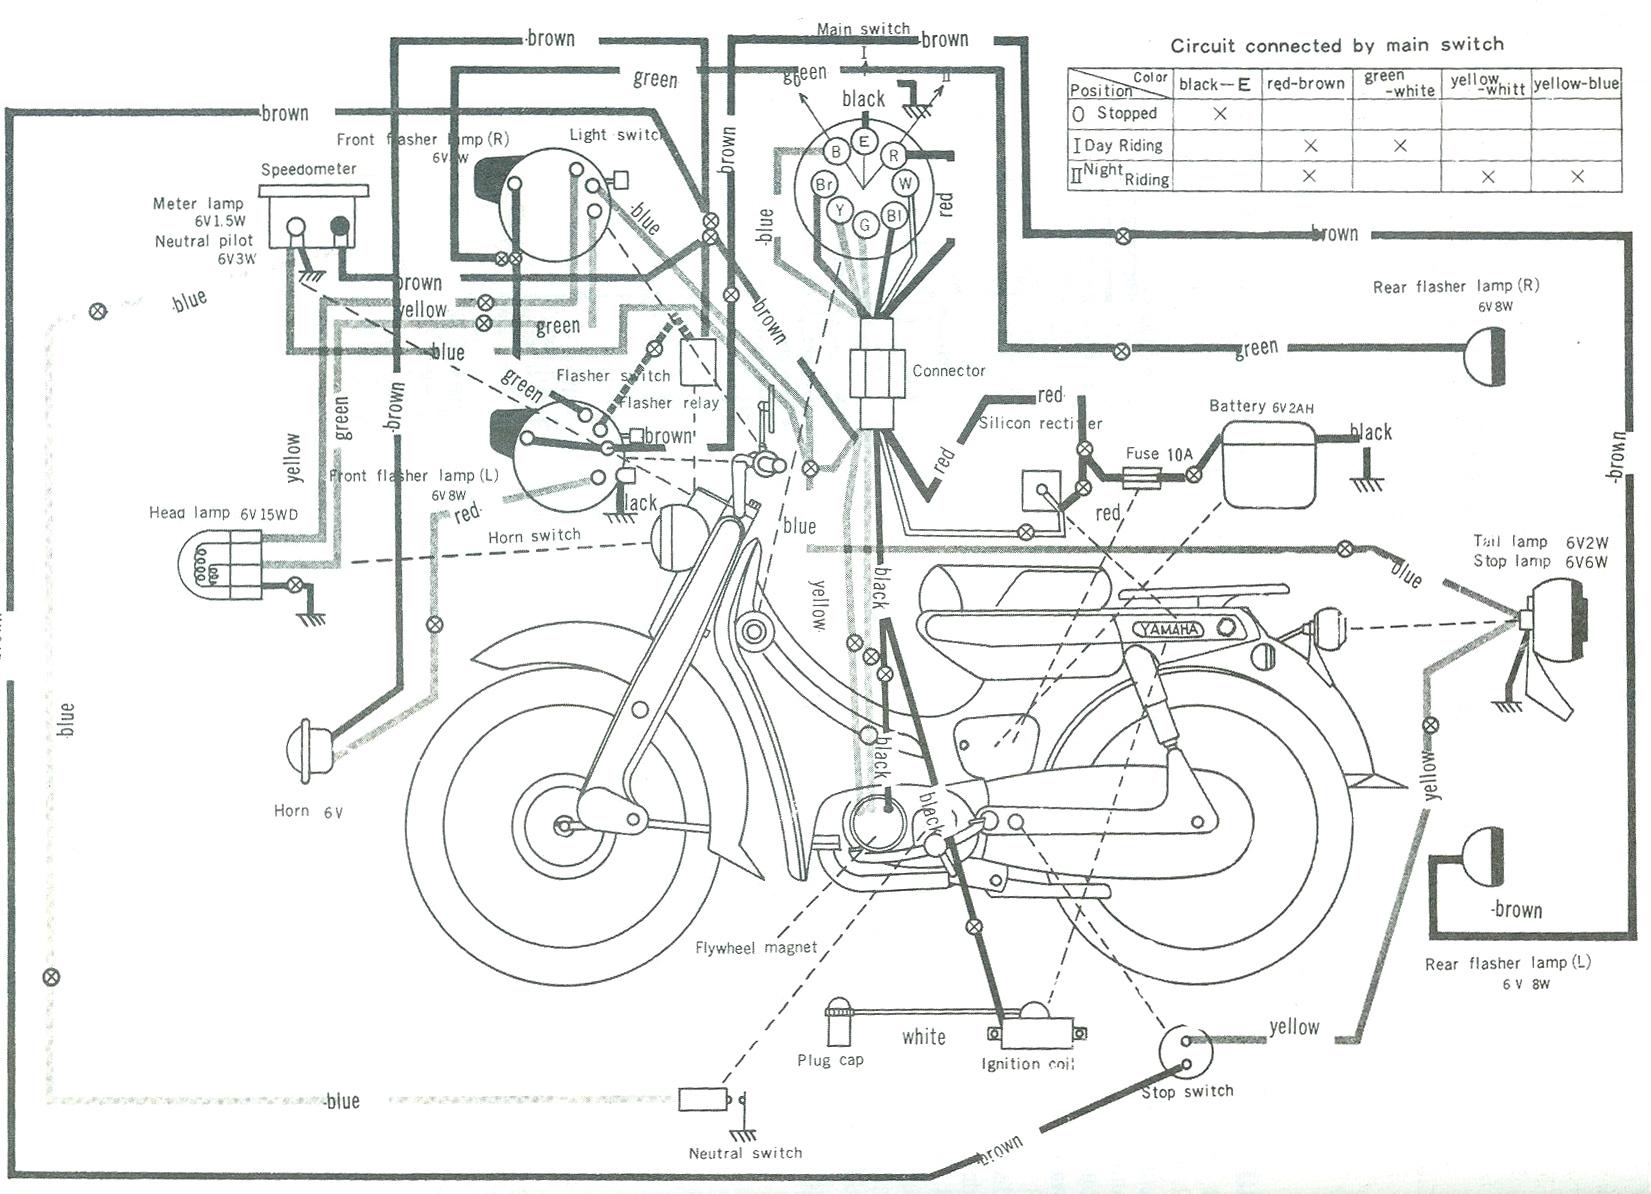 Yamaha Dt 100 Wiring Diagram Experts Rt100 1974 125 Enduro Service Manual Hobbiesxstyle Lt